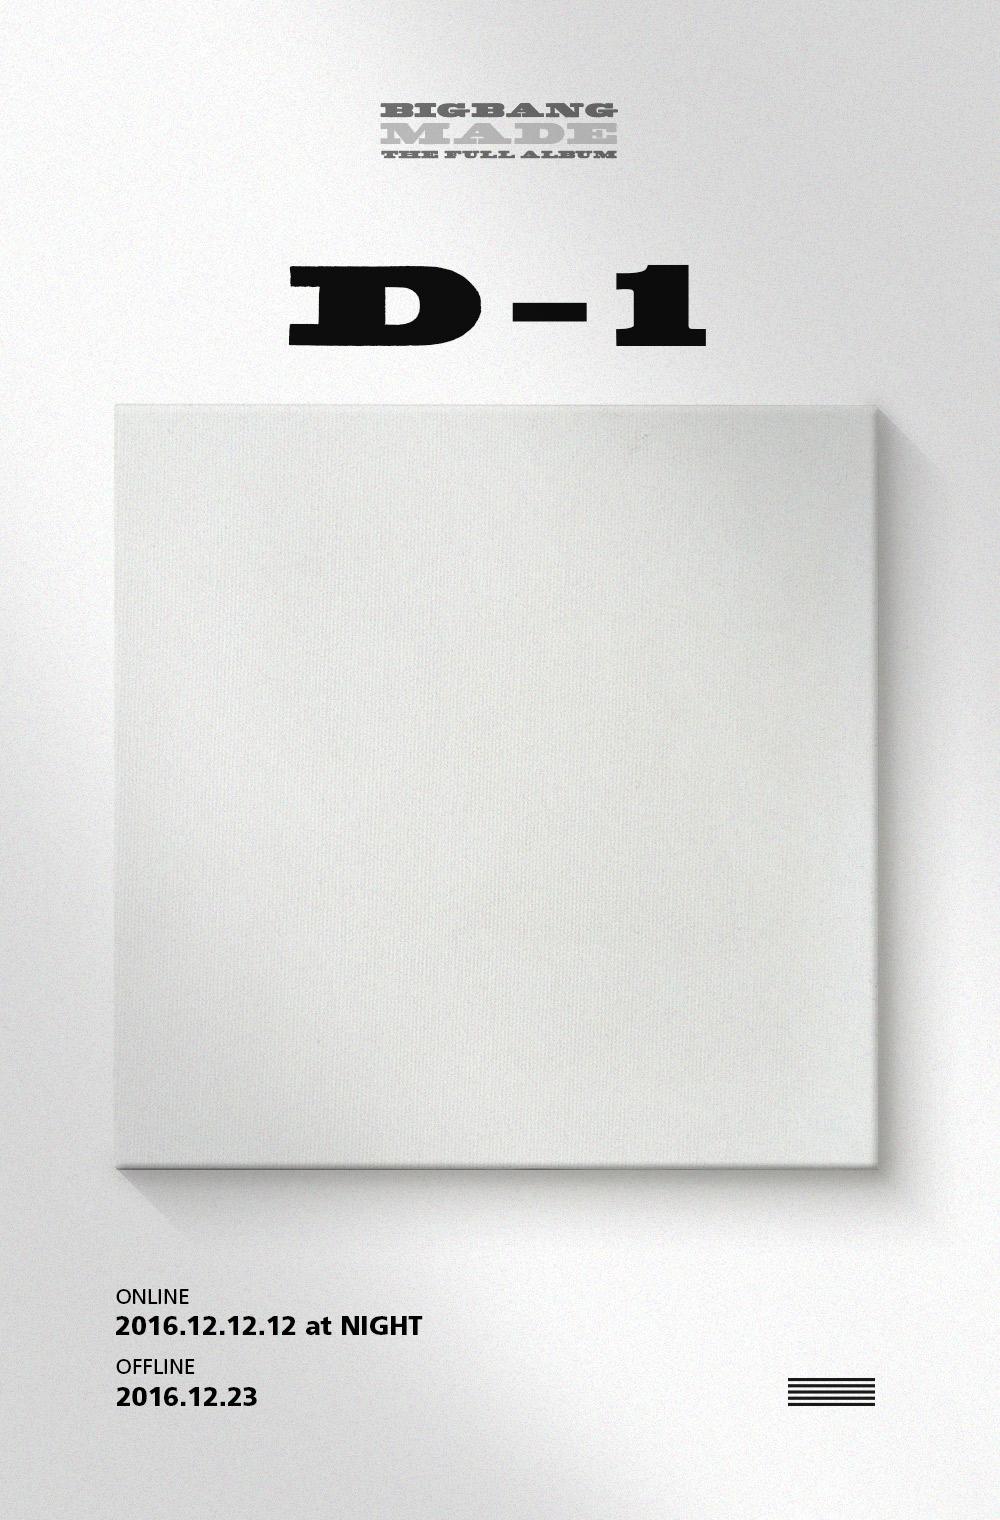 BB-DDAY-1_f